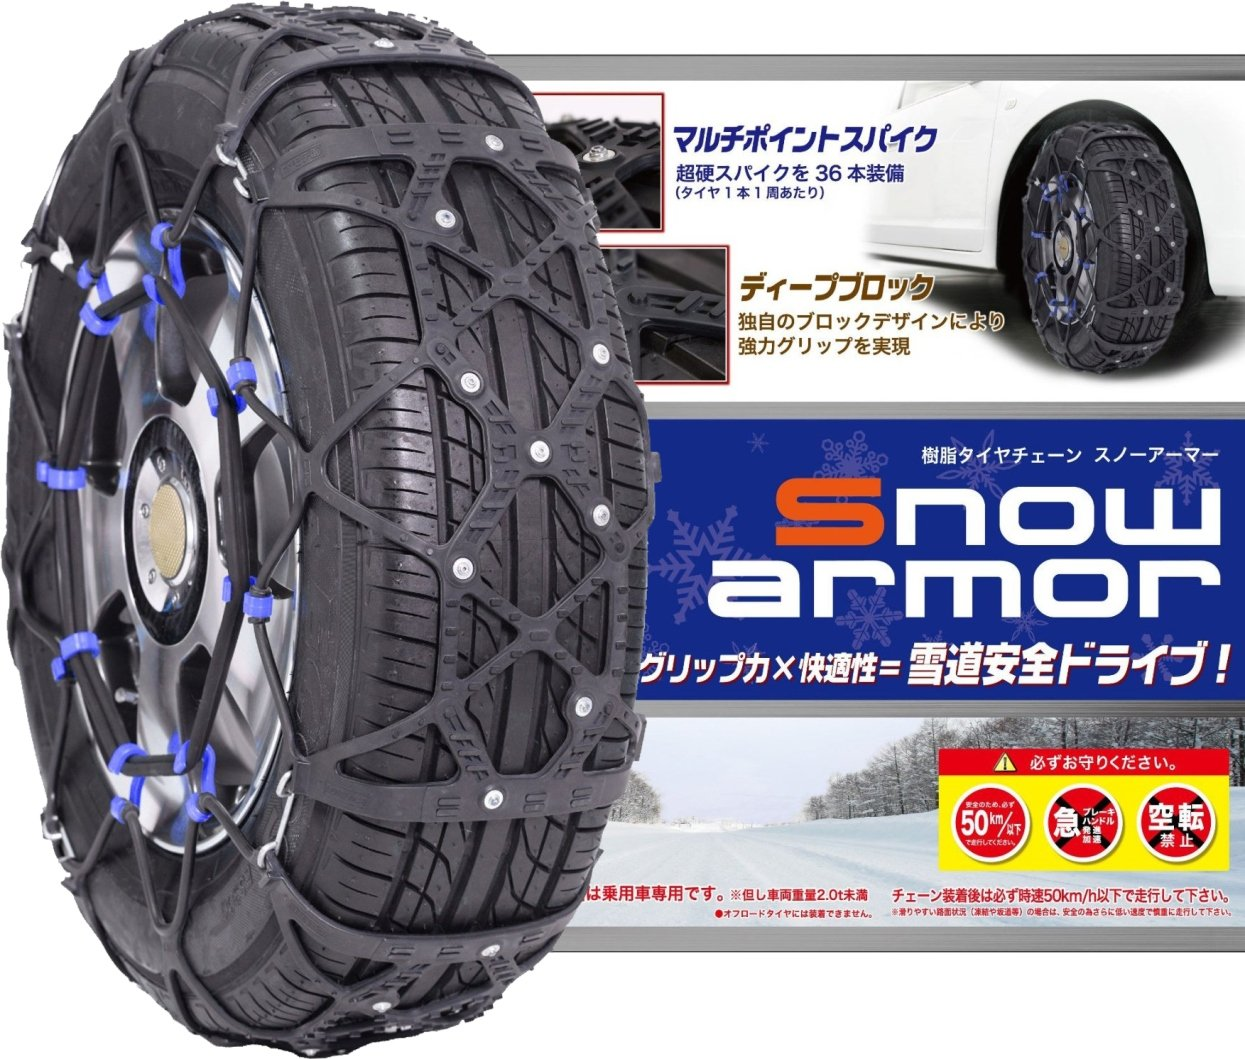 Snow armor (スノーアーマー) 非金属ウレタン樹脂タイヤチェーン CSA21 B00N0VQAHS